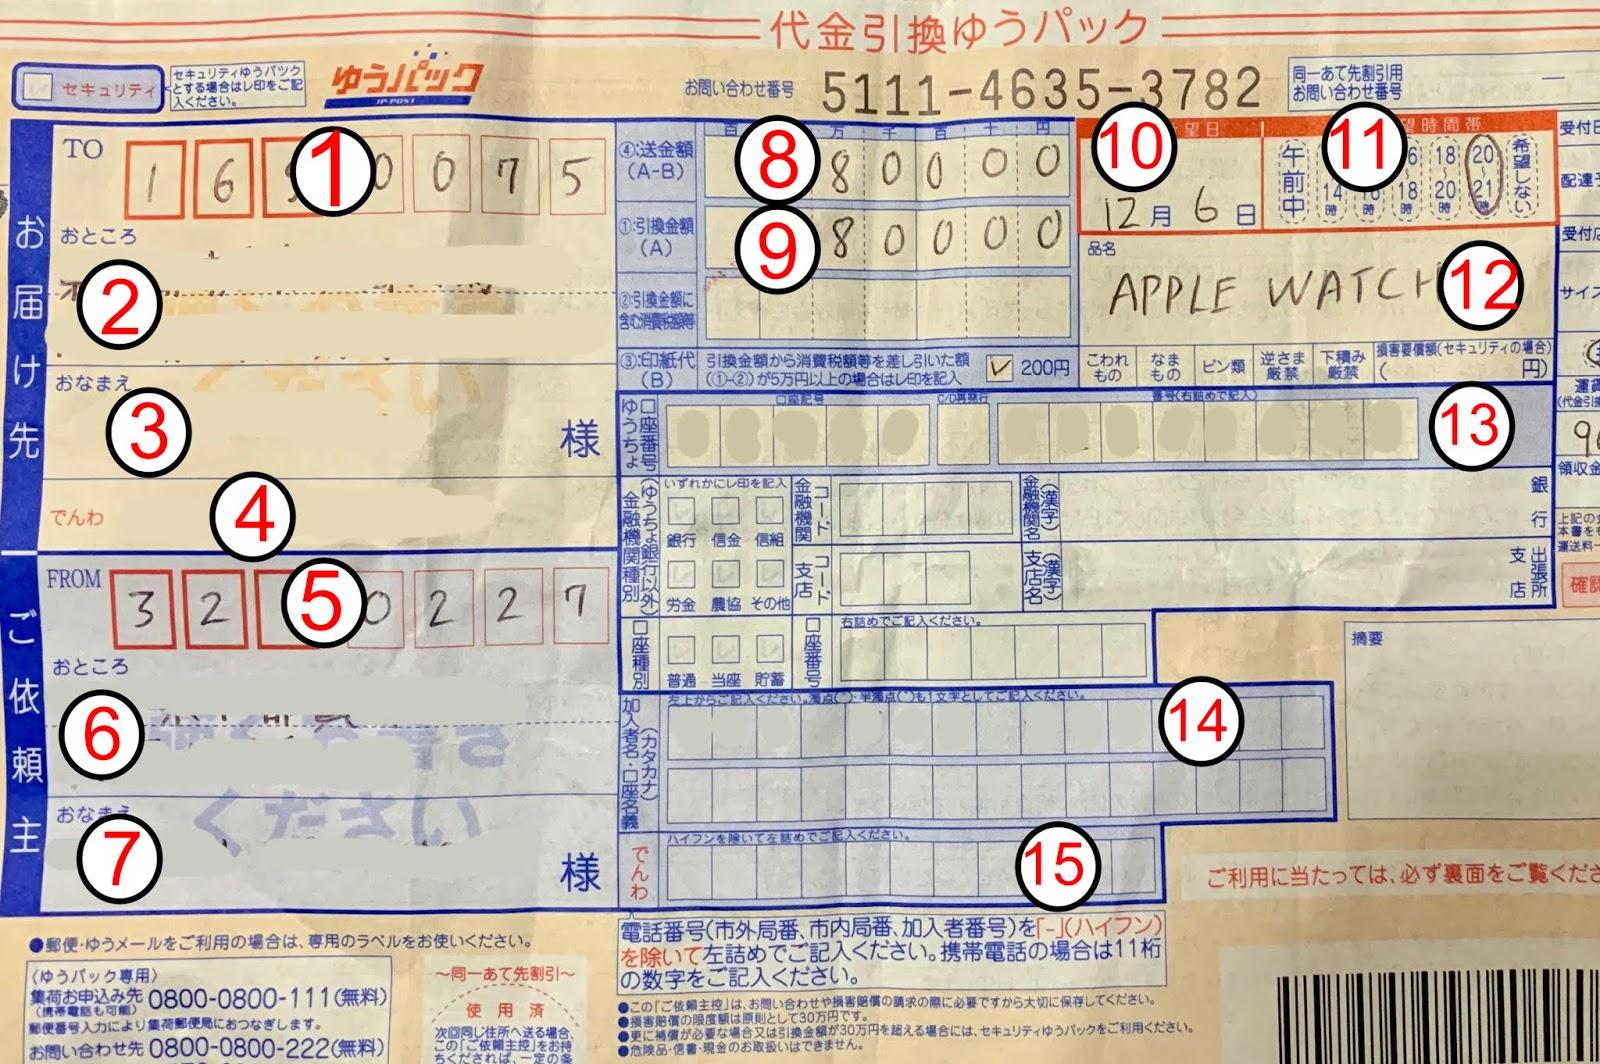 Cách gửi daibiki diiho.com